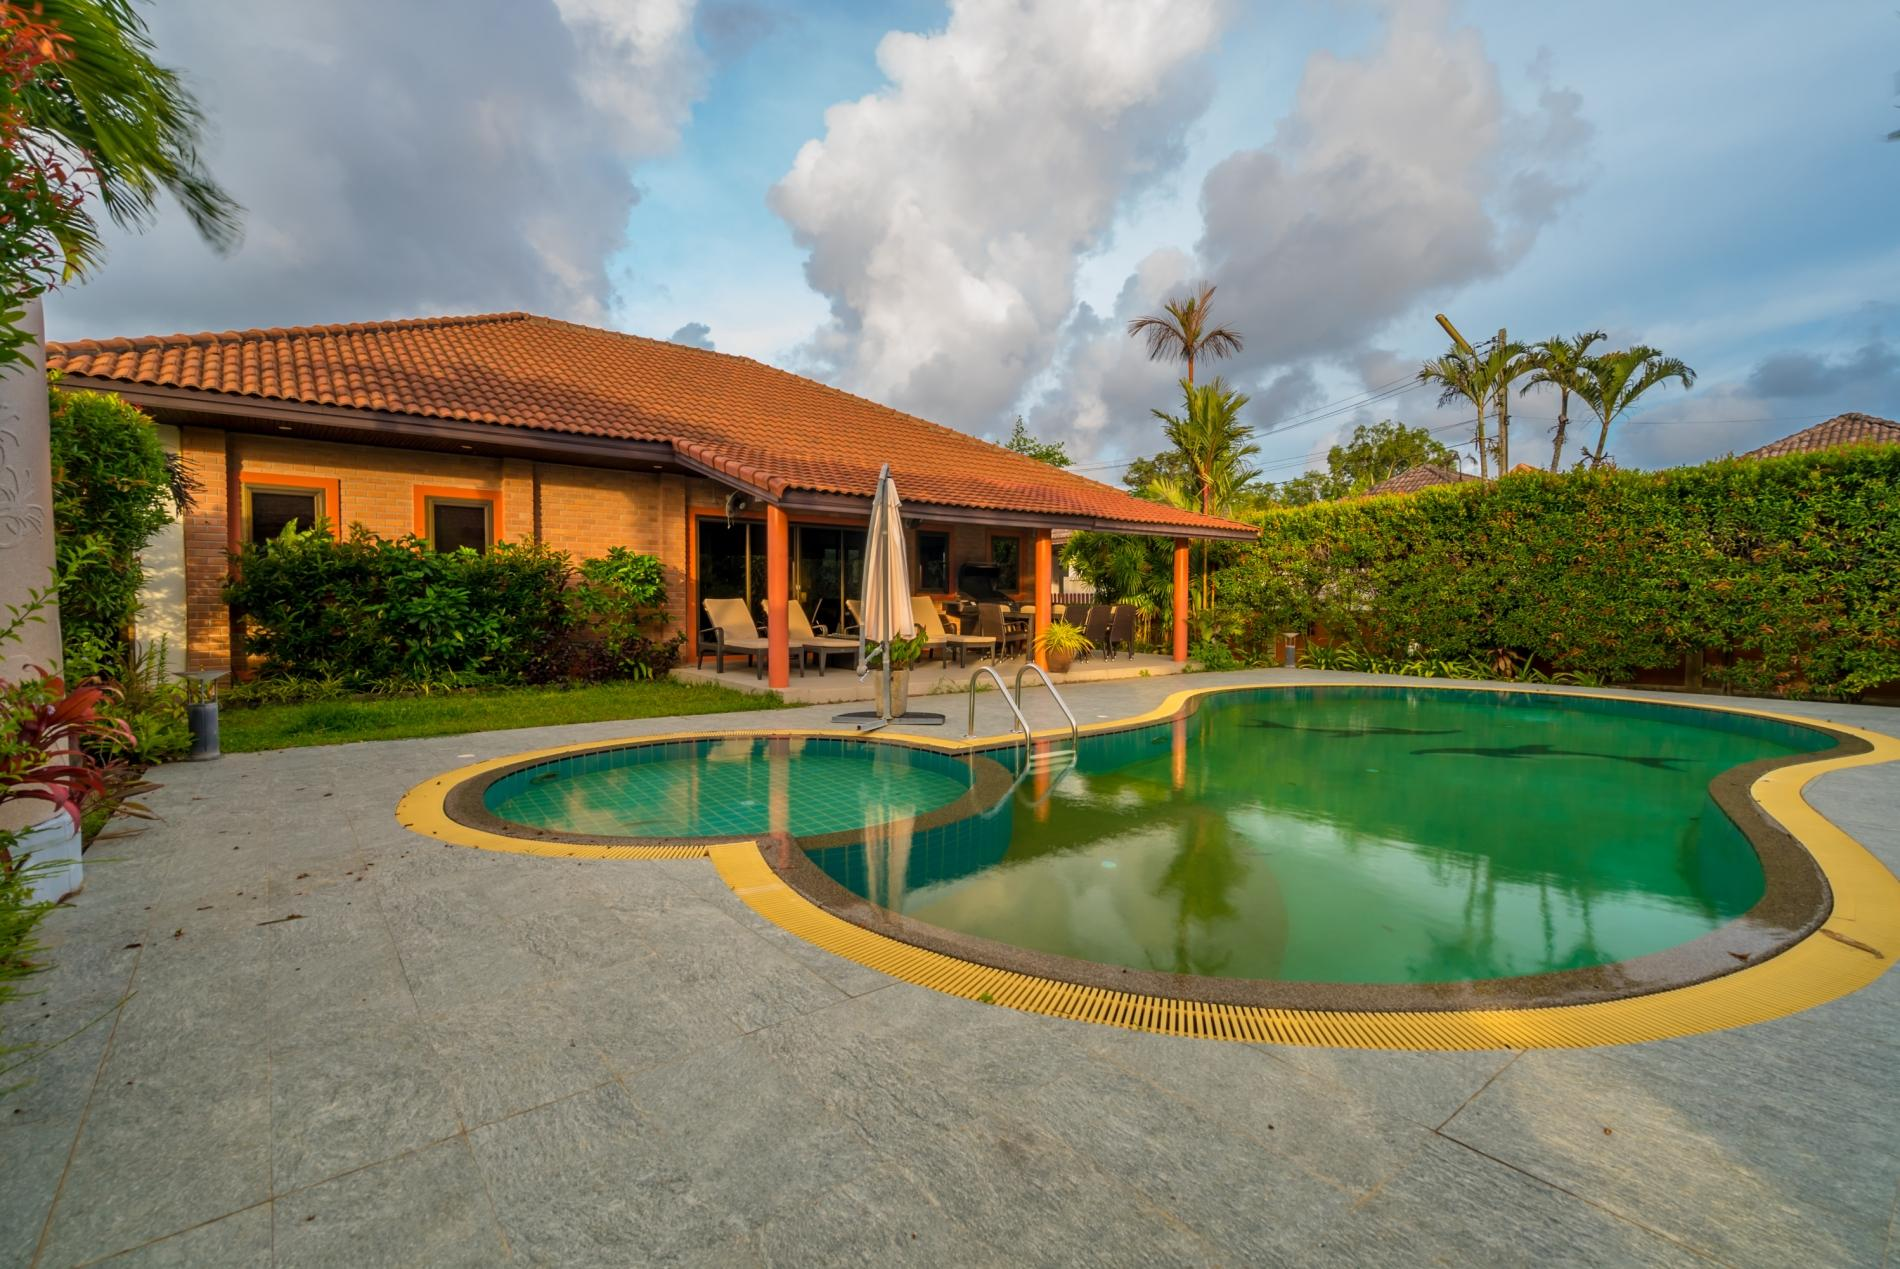 Apartment Pasak soi 3 - Convenient pool villa in quiet location  near Laguna  Boat avenue photo 19552920